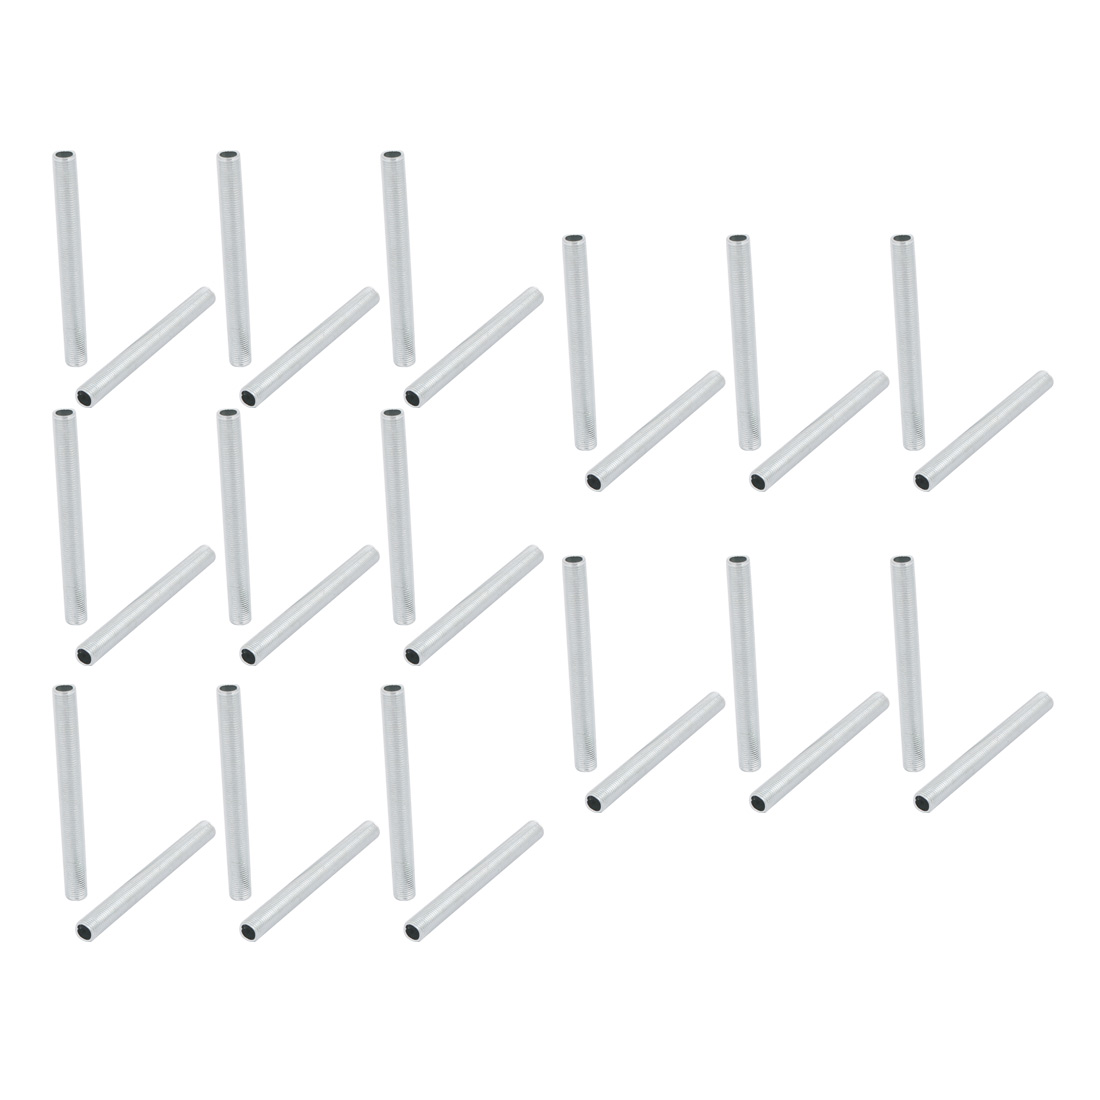 30 Pcs Metric M10 1mm Pitch Thread Zinc Plated Pipe Nipple Lamp Parts 95mm Long